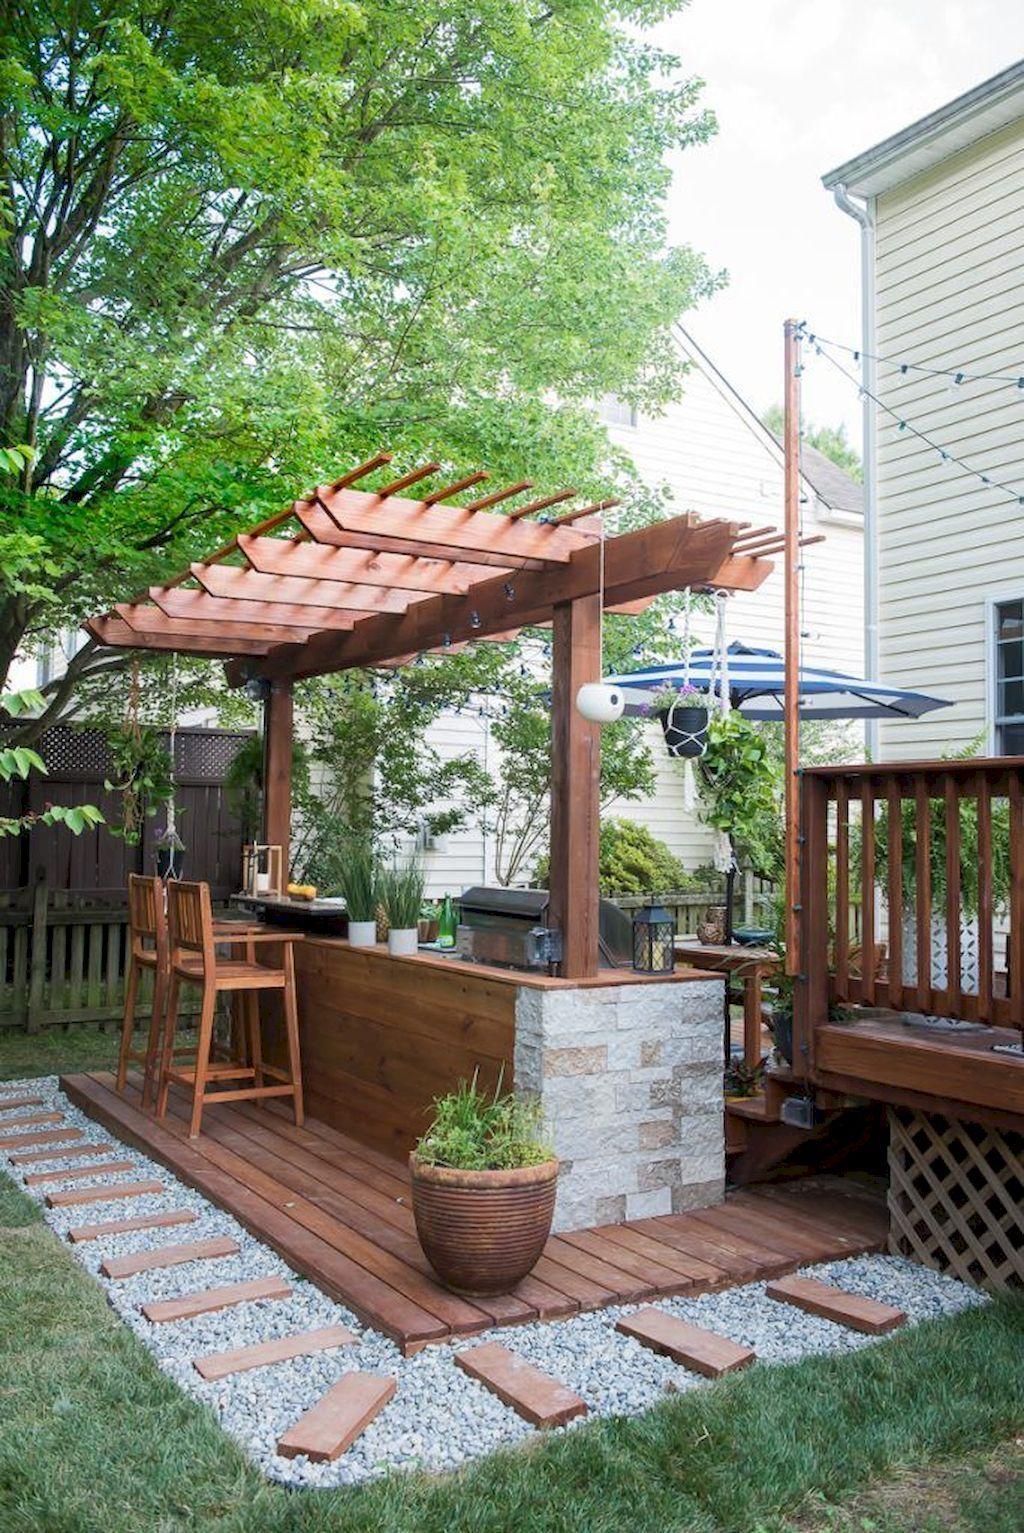 Outdoorideasforadults Outdoor Kitchen Design Diy Outdoor Kitchen Backyard Pergola